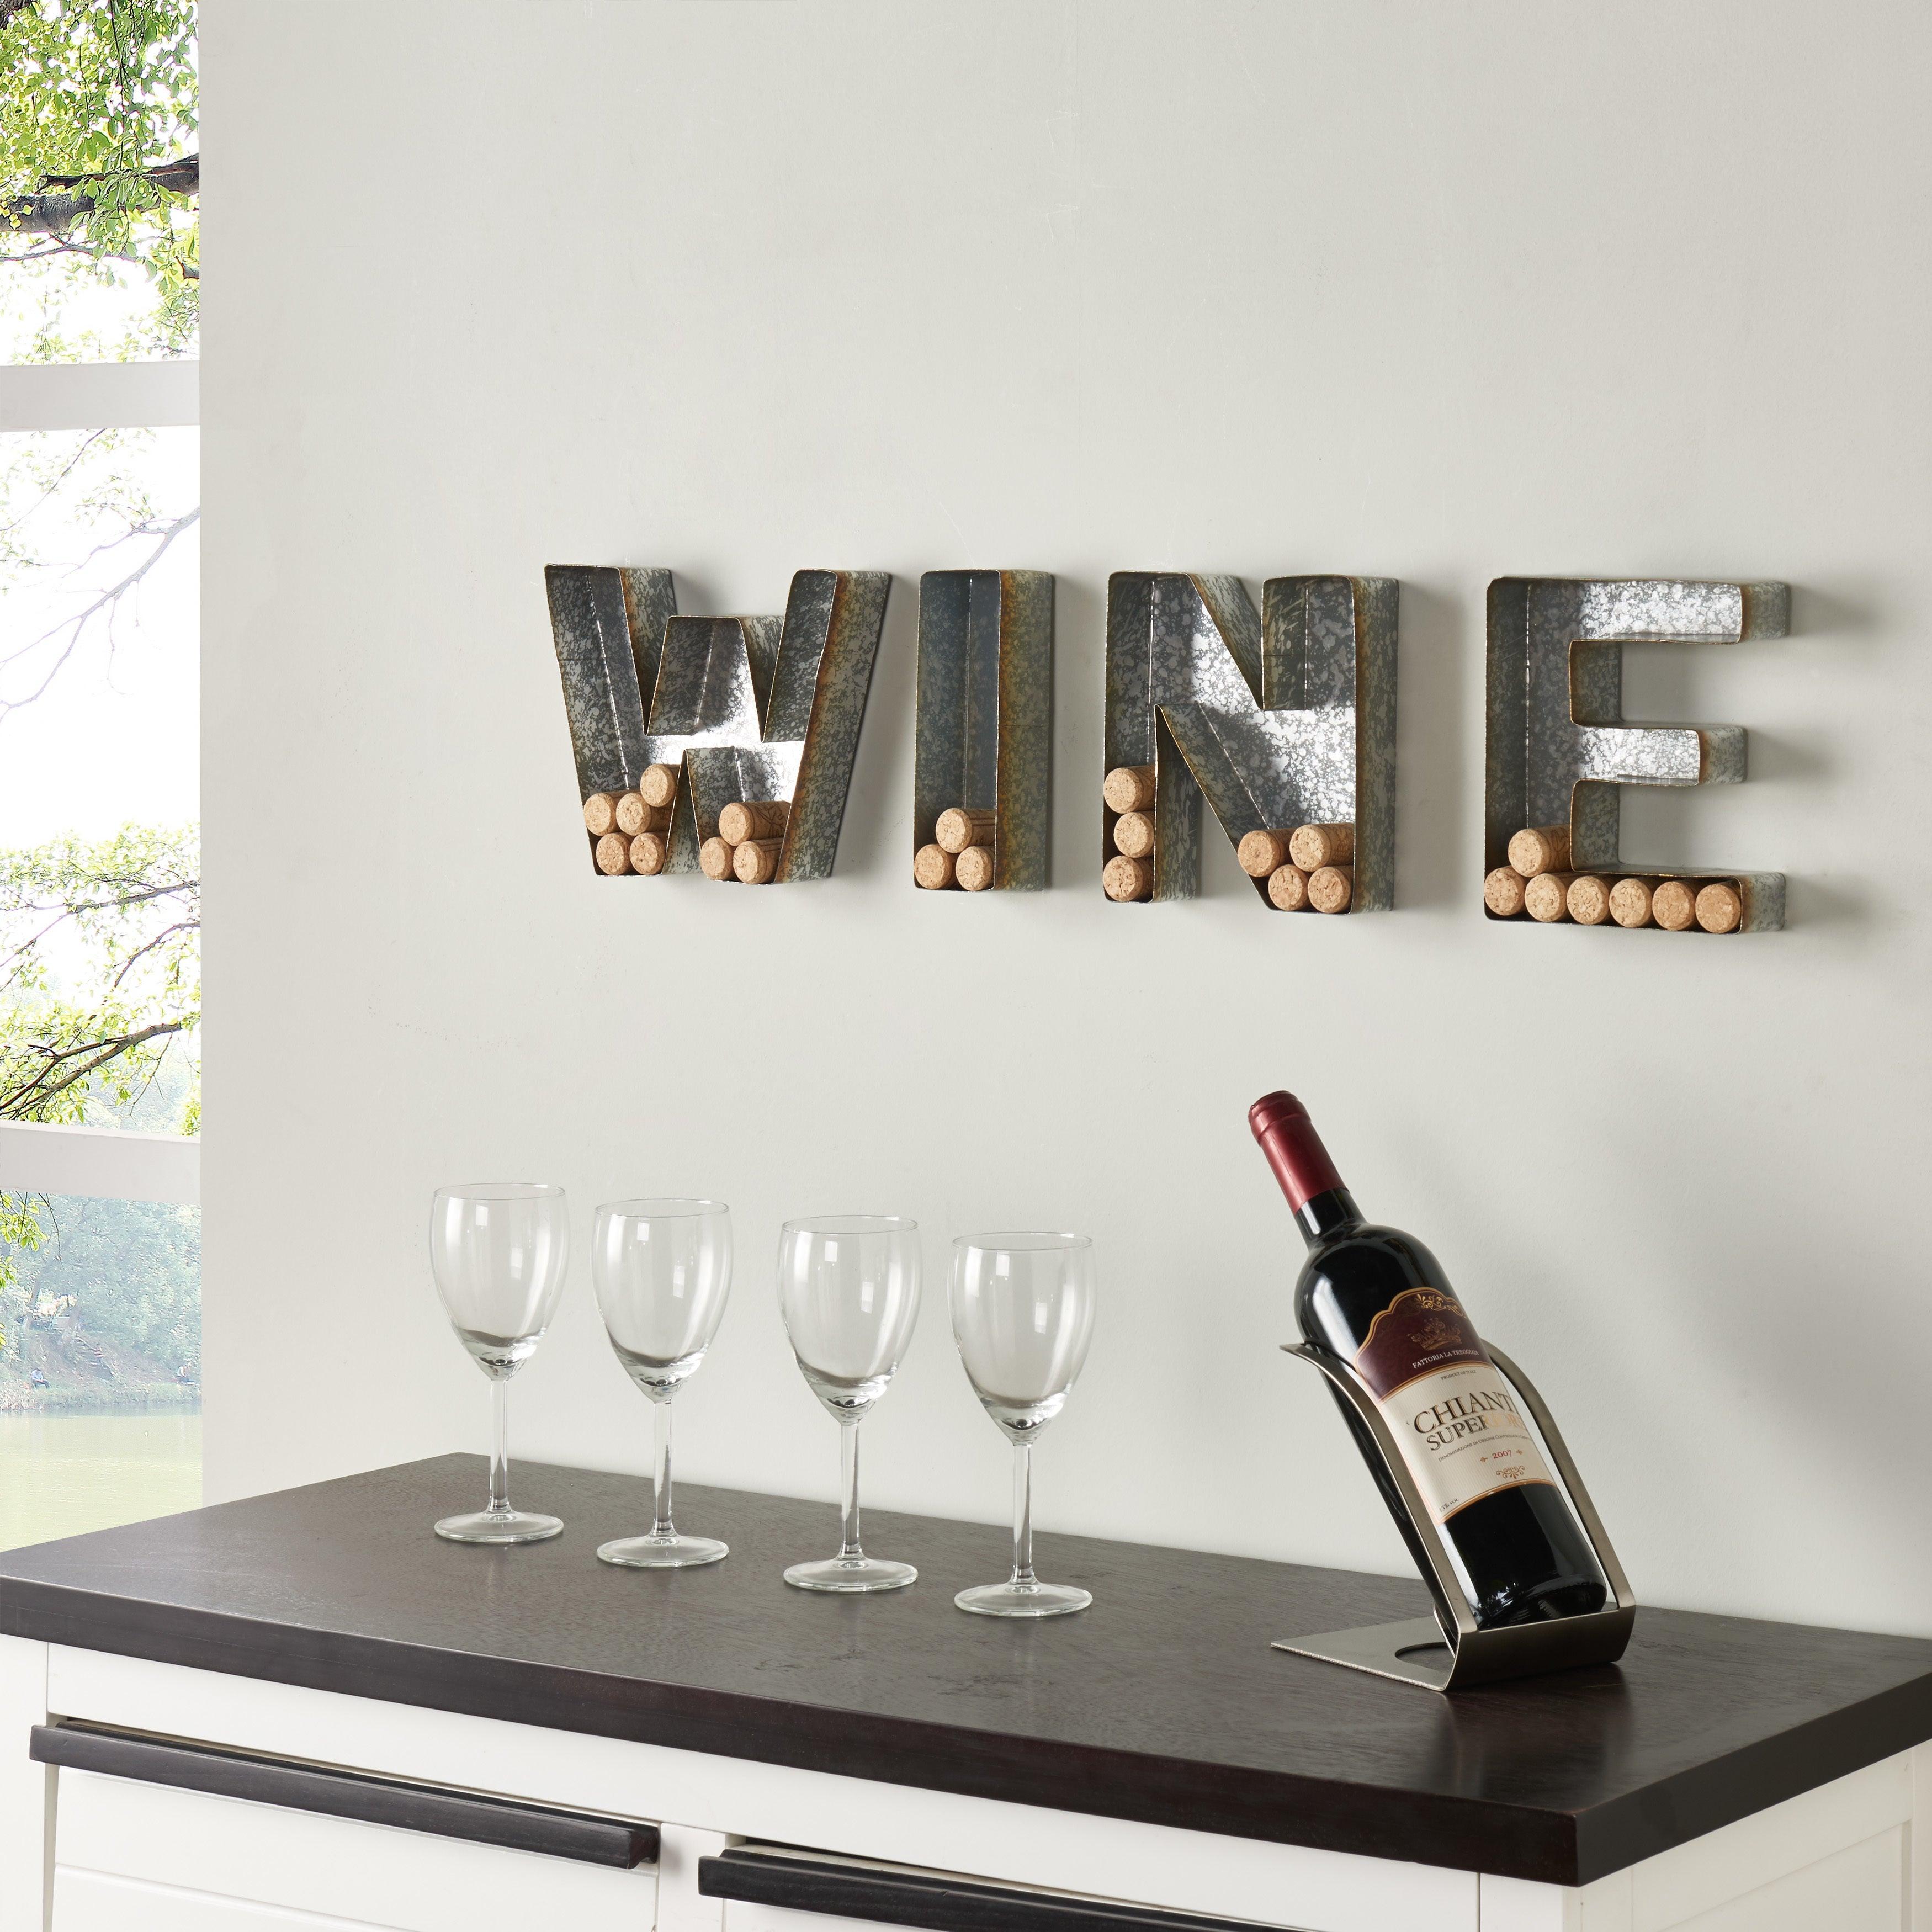 wine wall decor cork holder metal home bar kitchen rustic farmhouse gift new | ebay